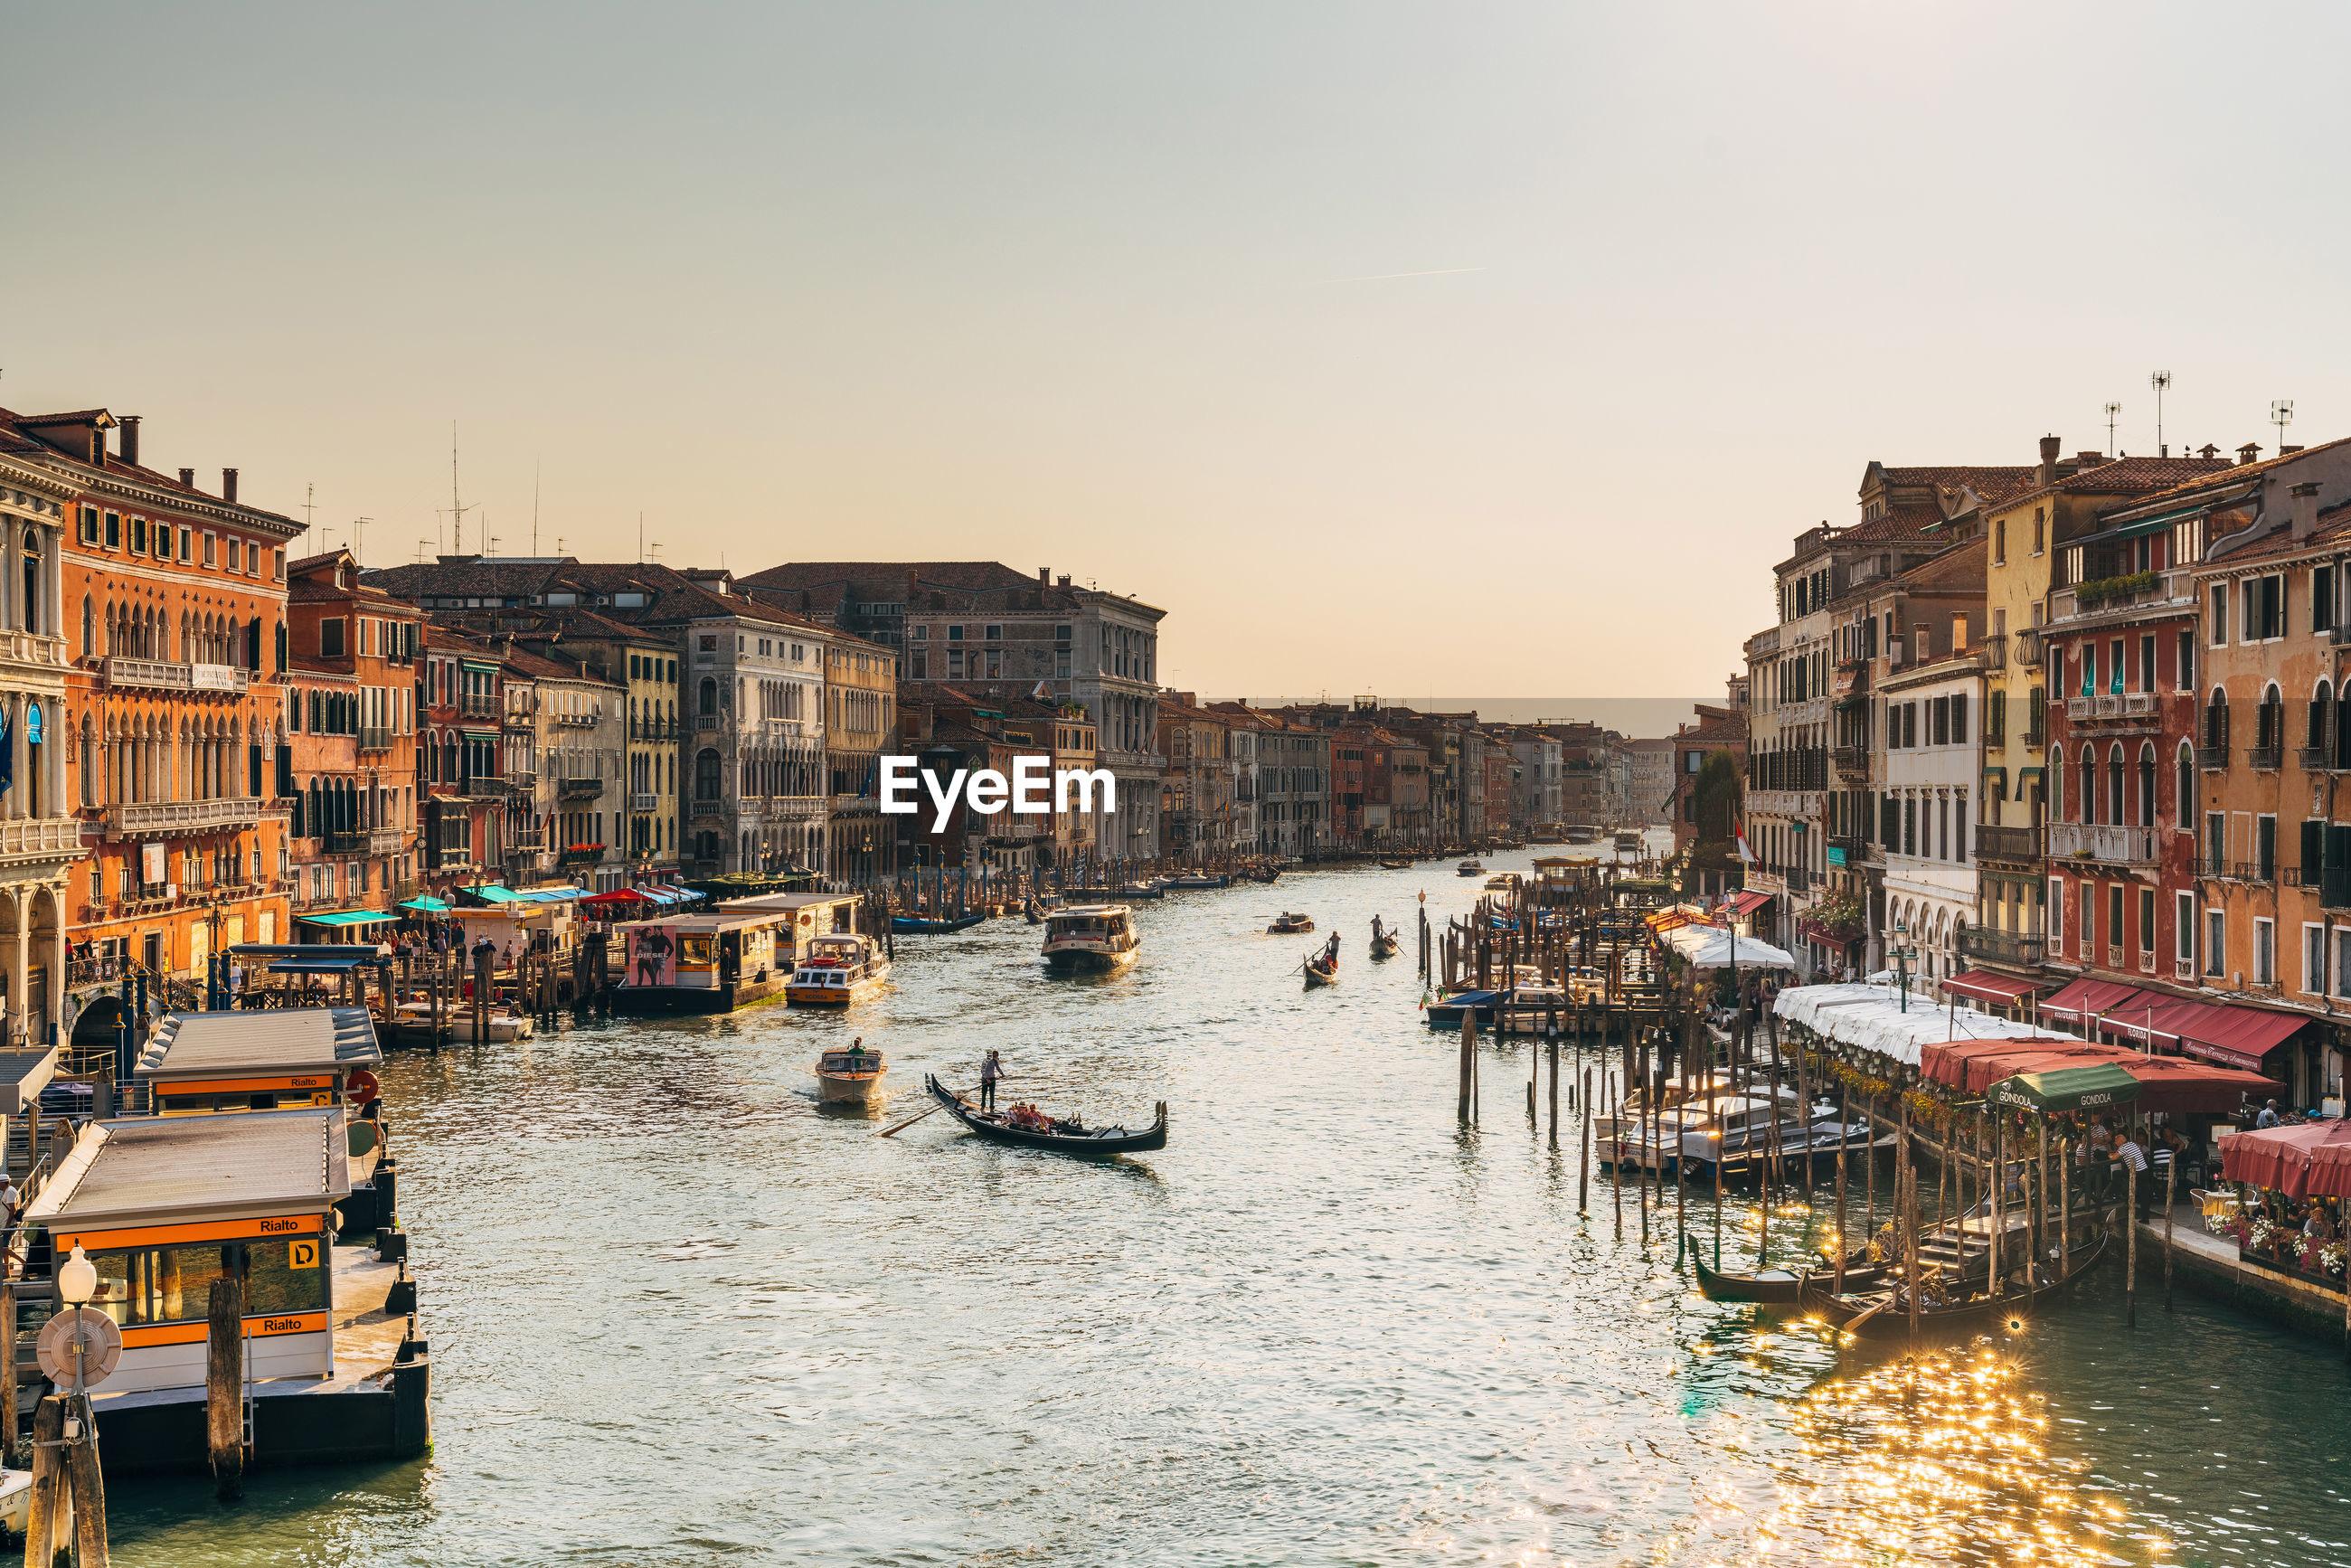 Venice cityscape at sunset